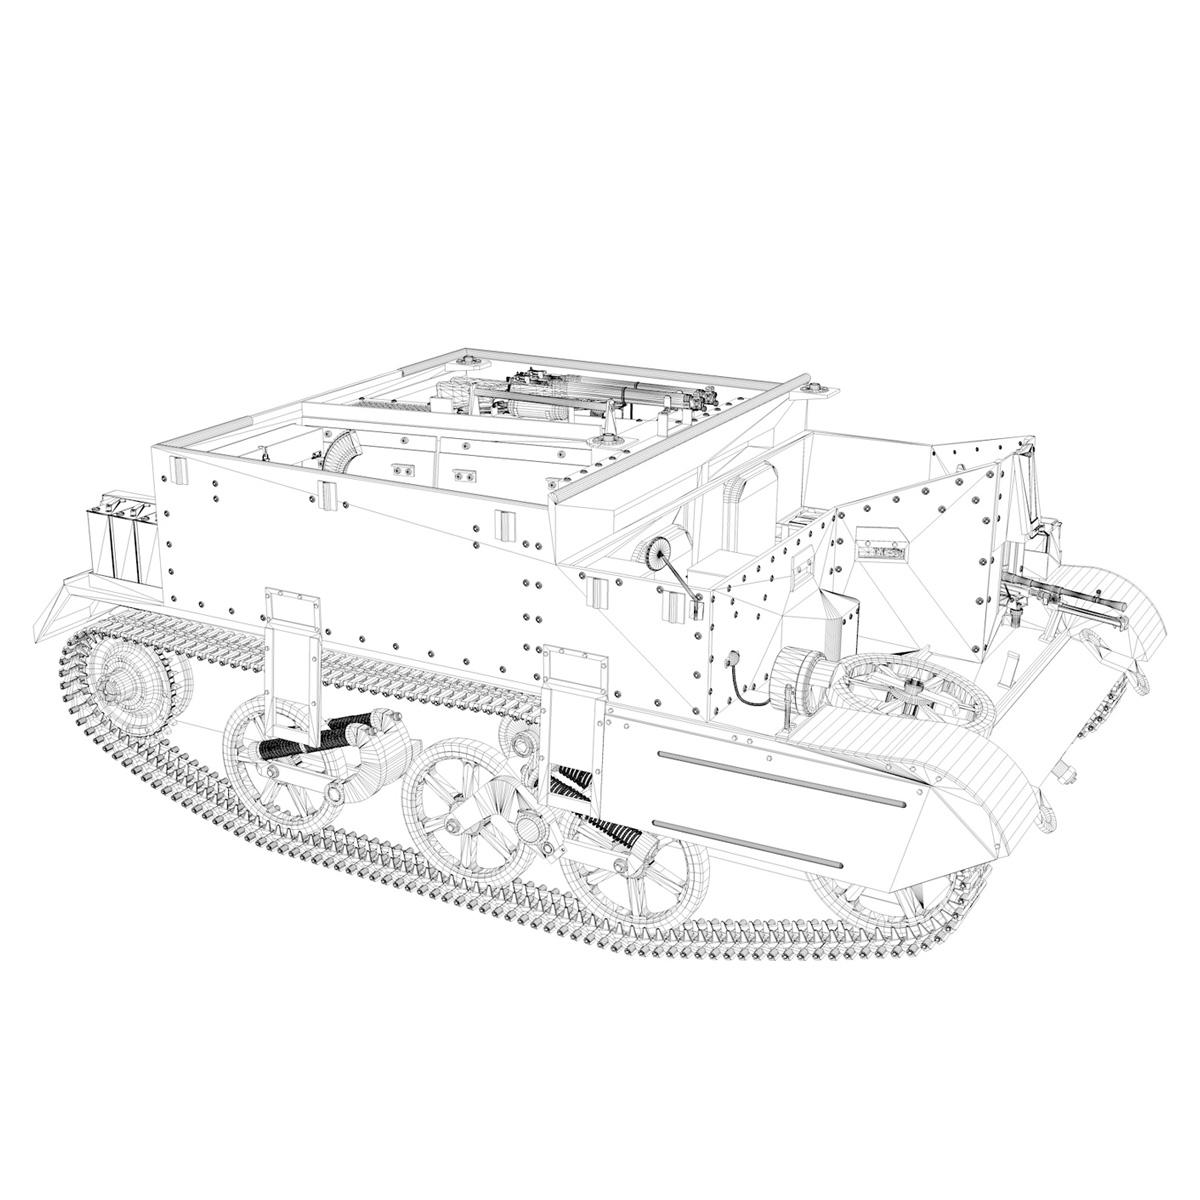 Universal Carrier MK II - Bren Gun Carrier 3d model 3ds fbx c4d lwo lws lw obj 272966